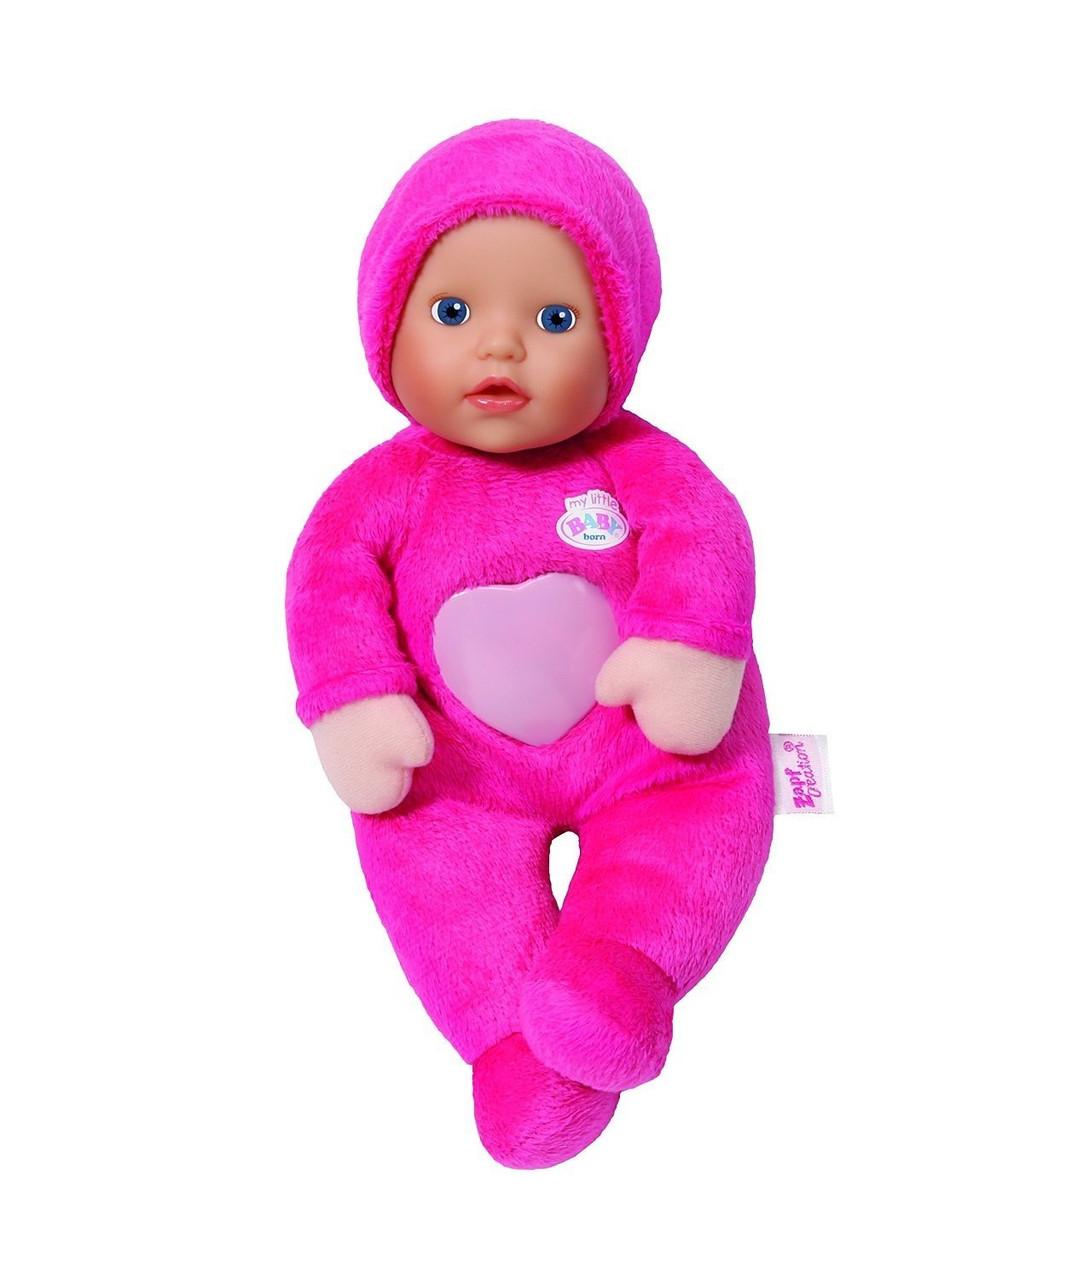 Кукла Беби Борн ночник Ночной друг интерактивная оригинал My Little Baby Born Zapf Creation 820858